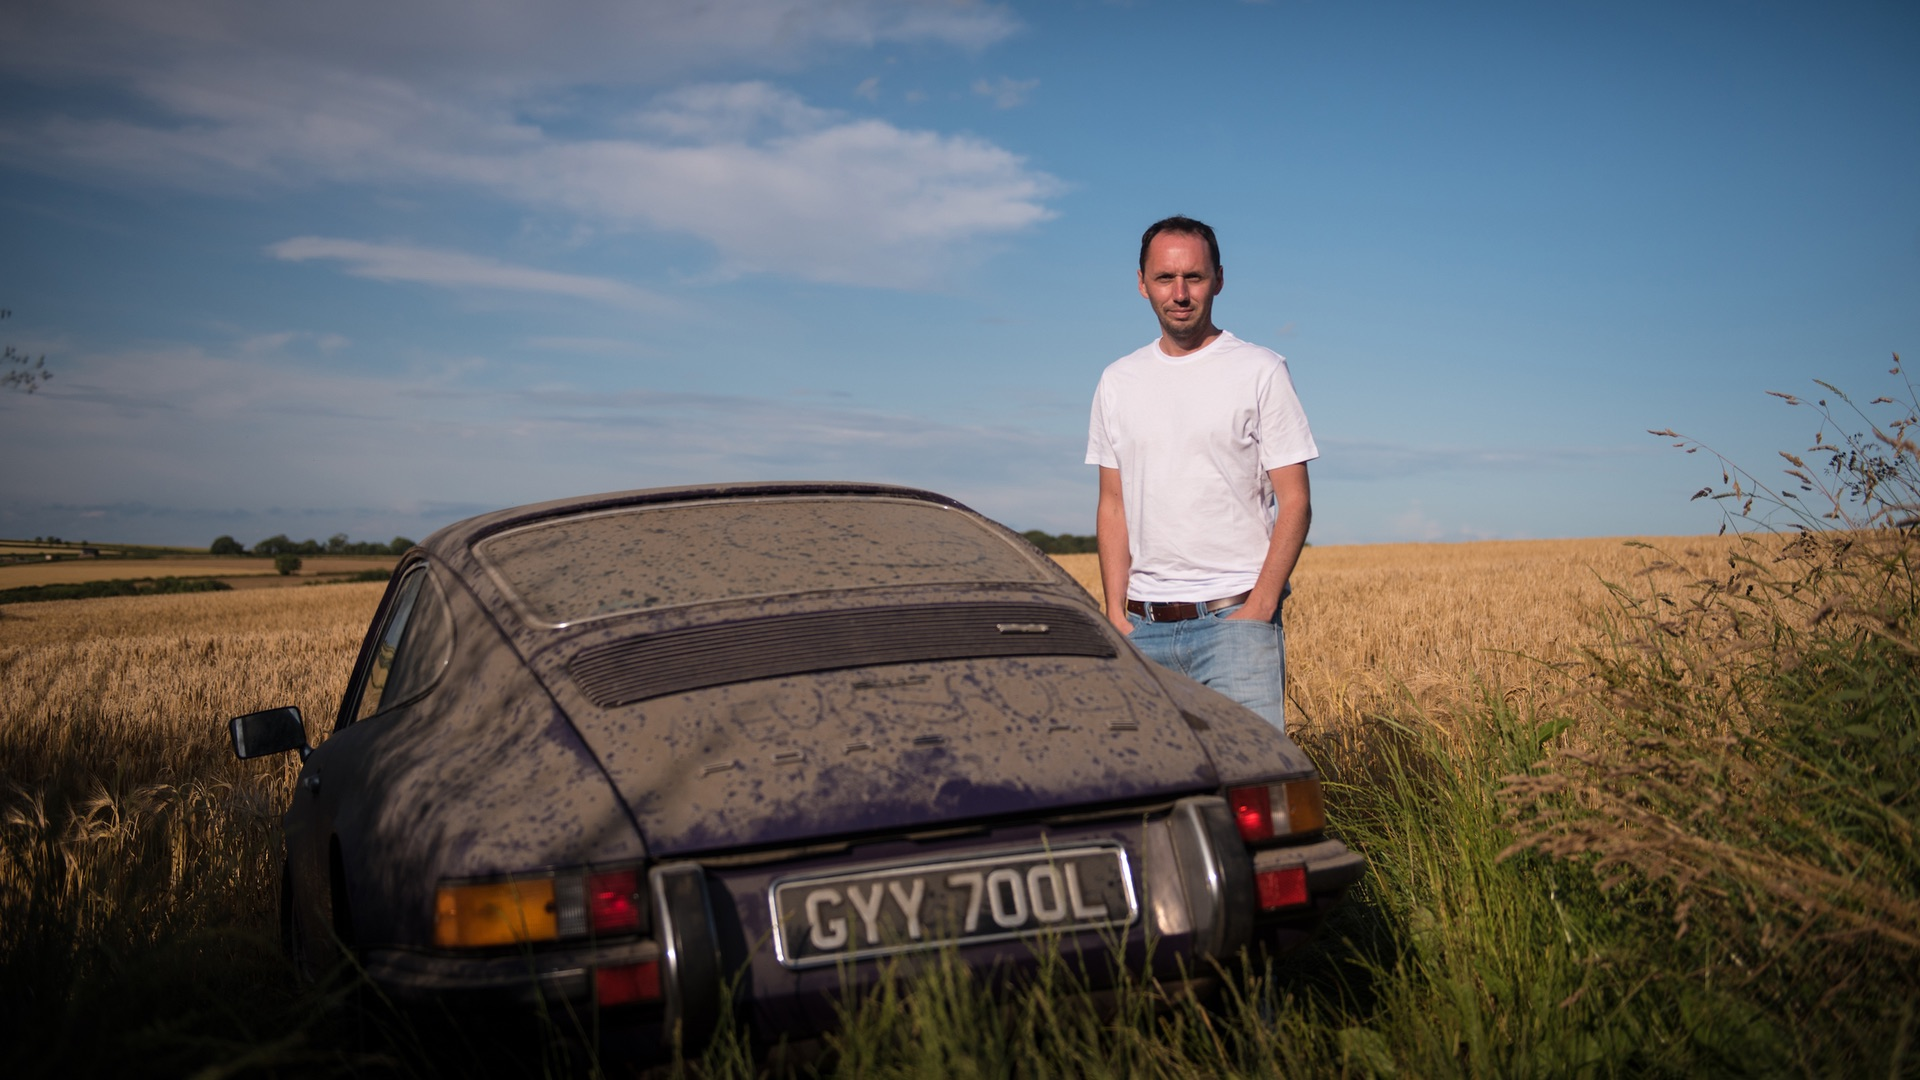 Classic Porsche saved